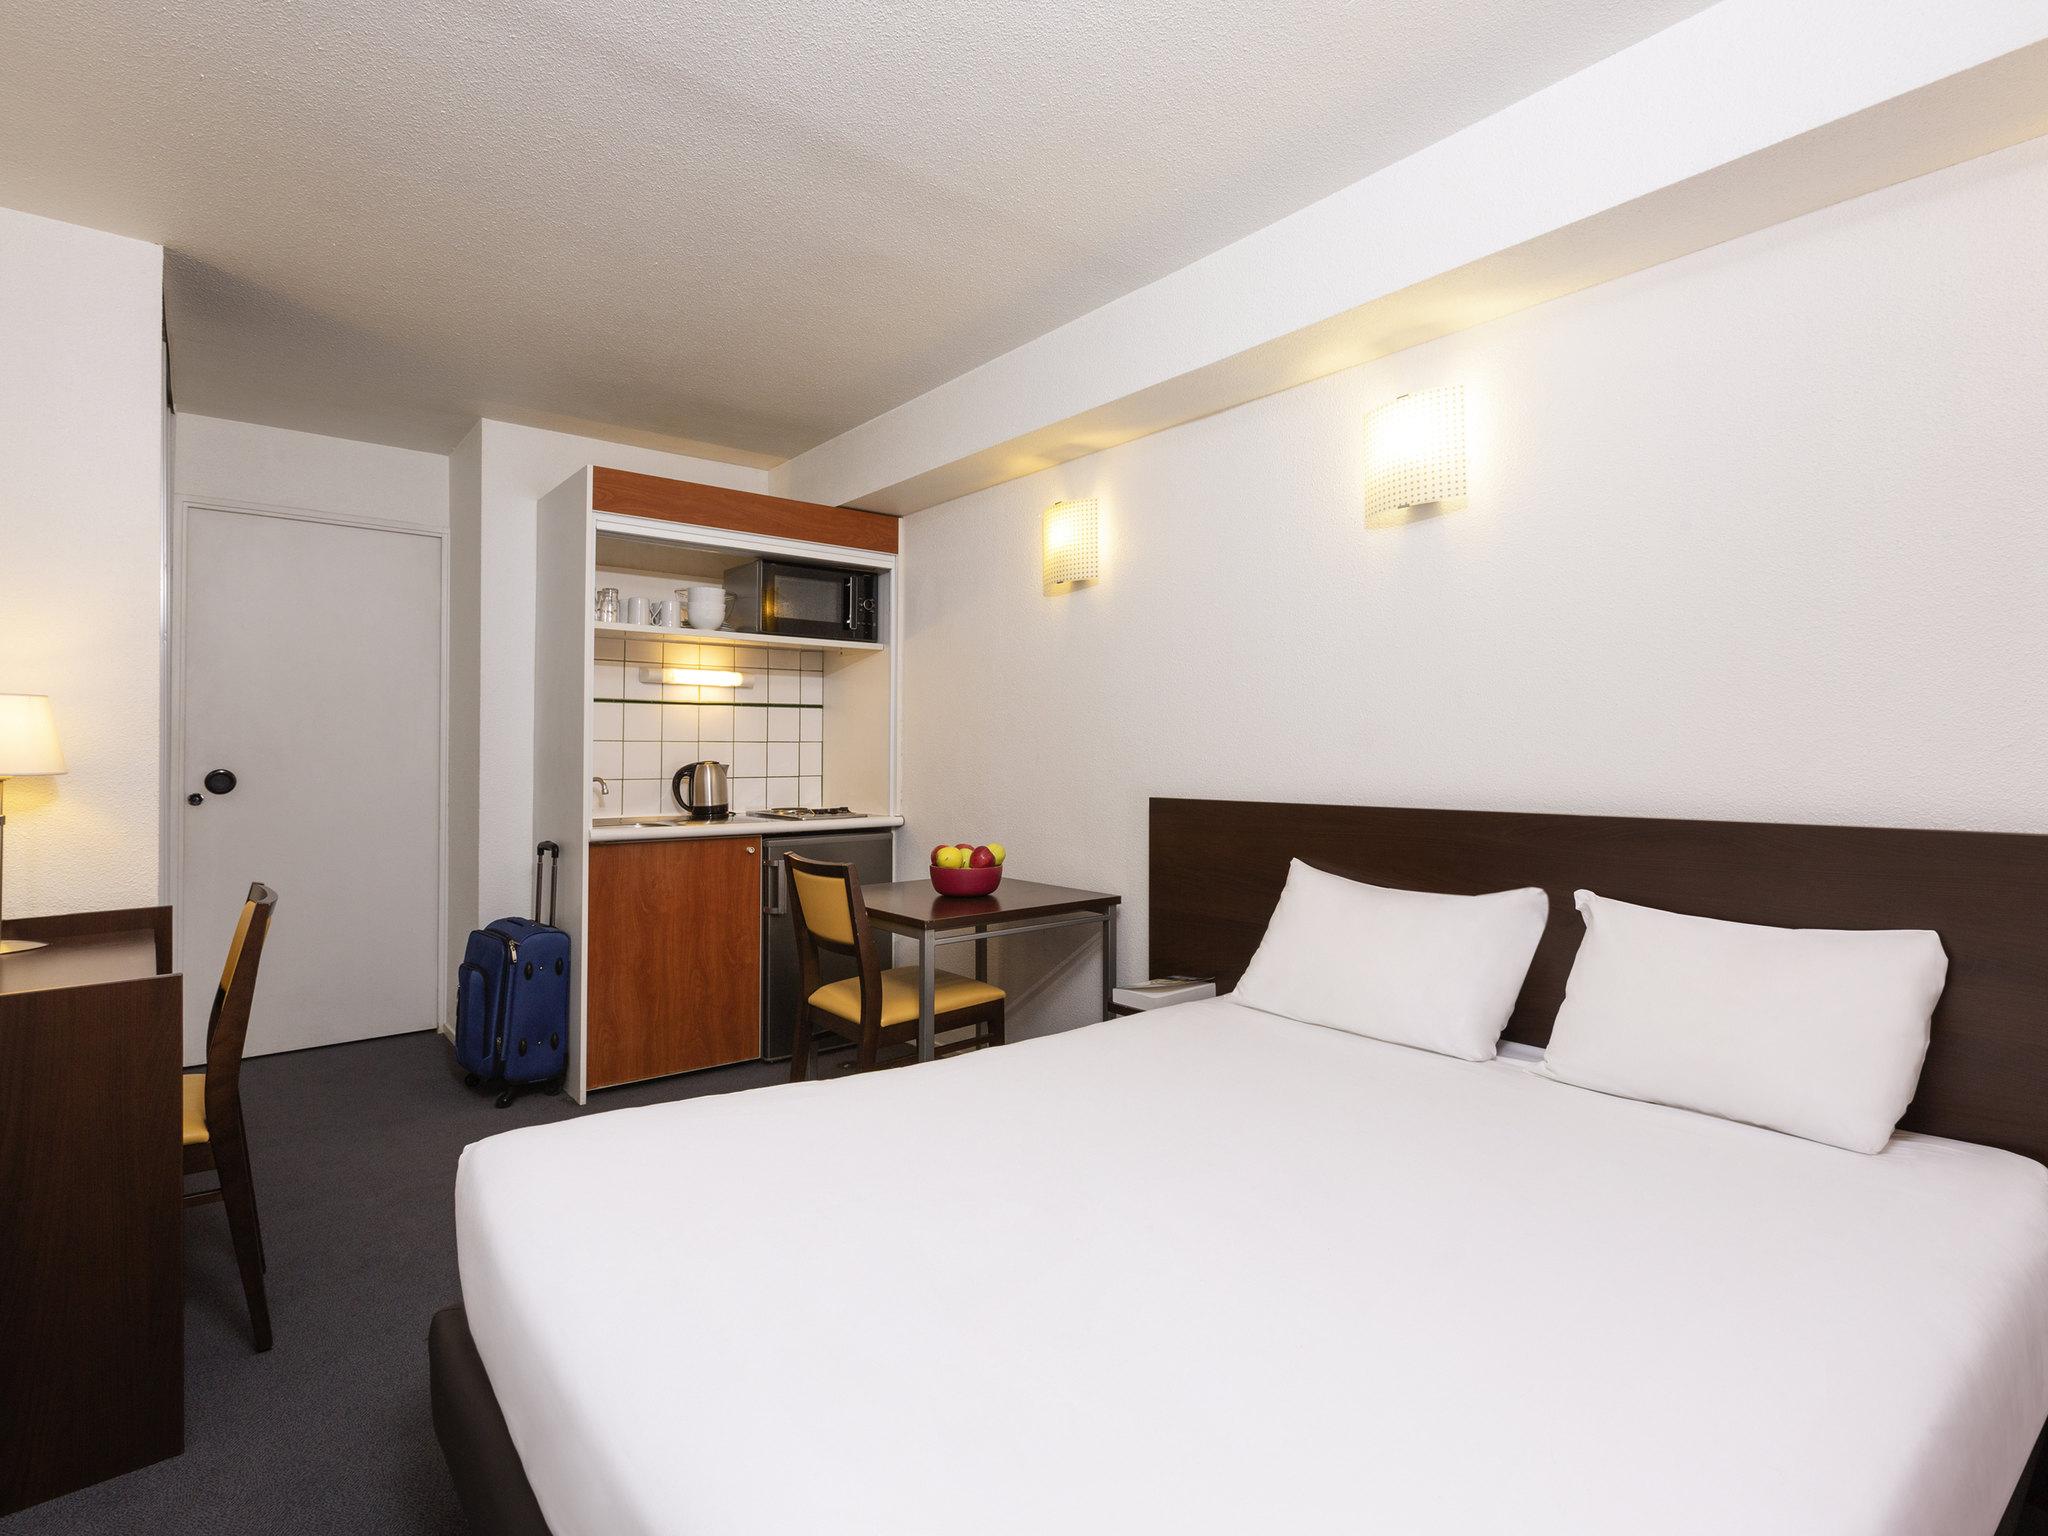 Hôtel - Aparthotel Adagio access la Défense Léonard de Vinci